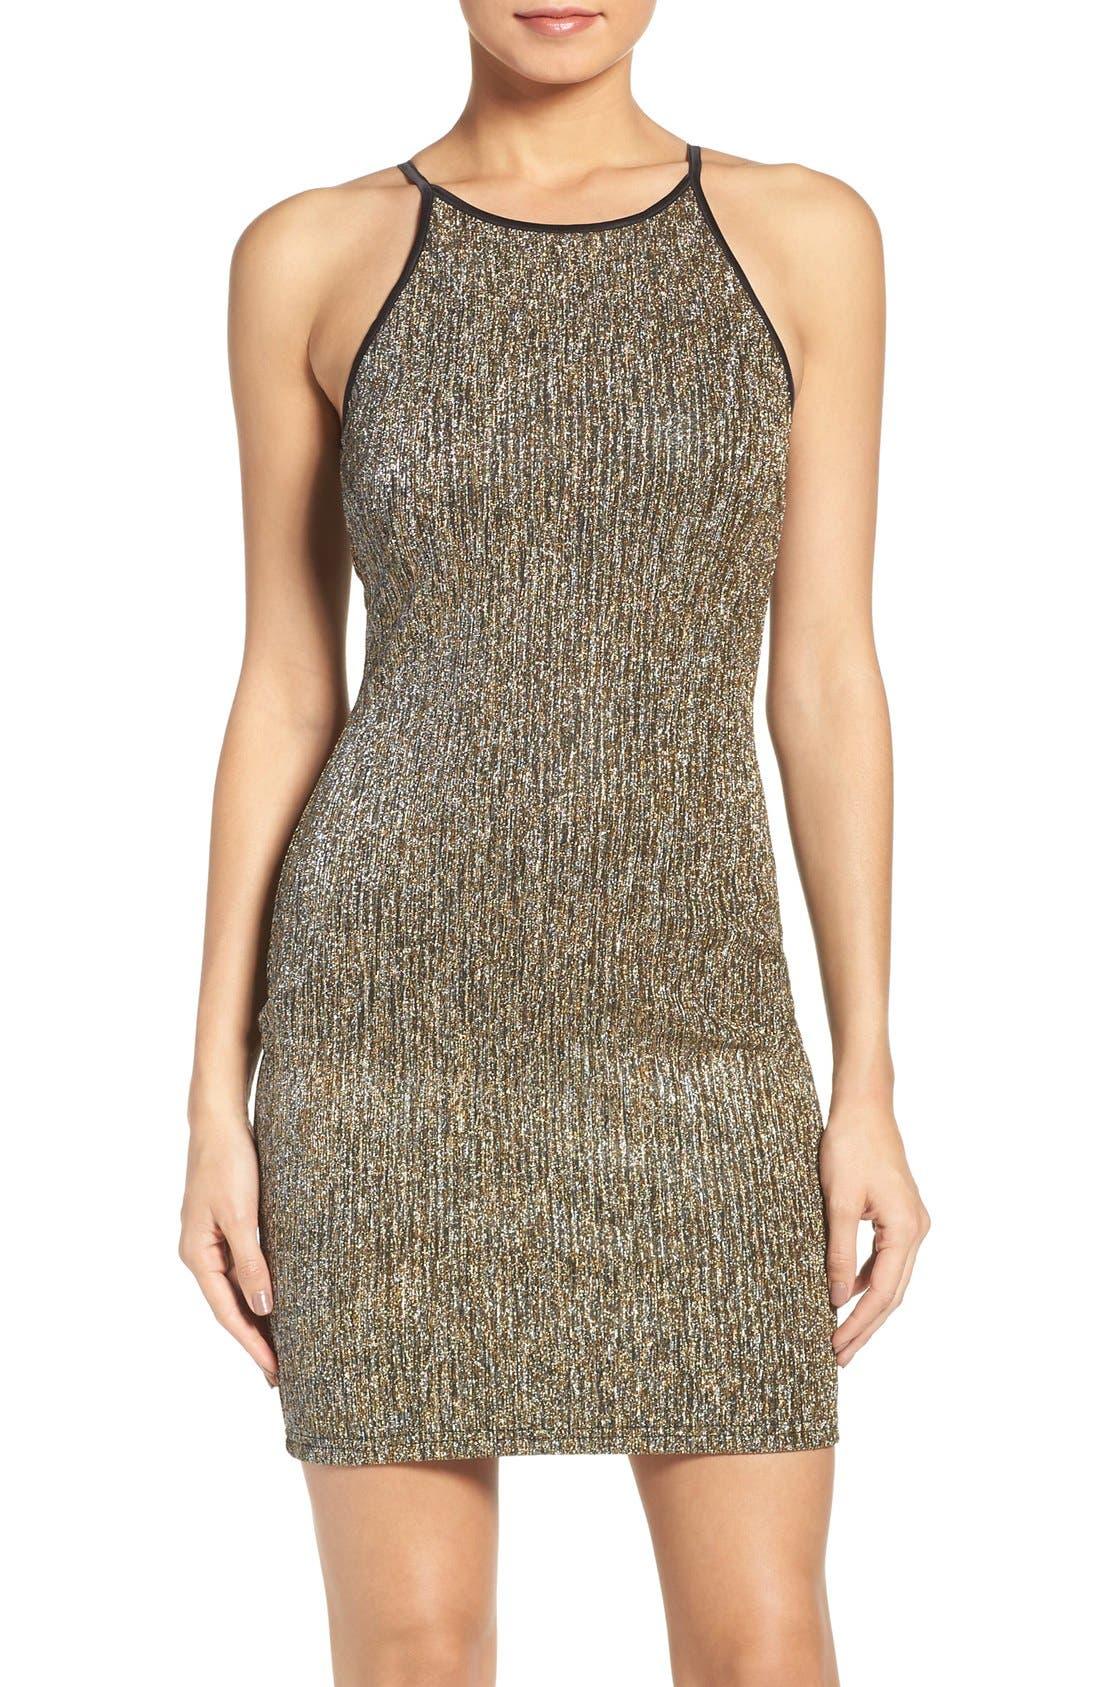 Main Image - Gerylin Metallic Knit Body-Con Dress